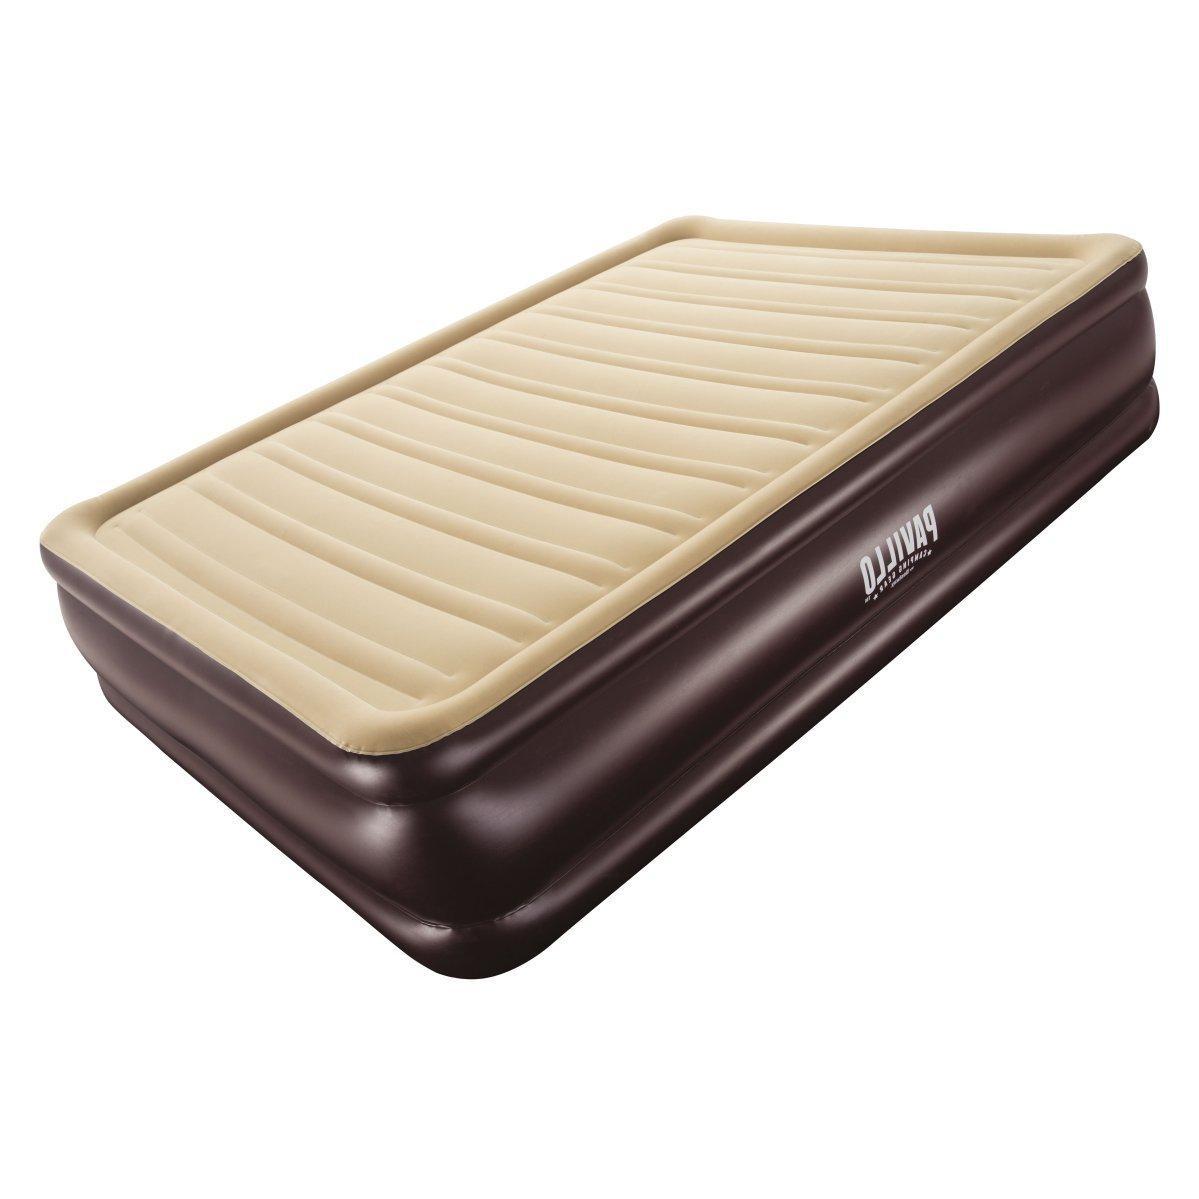 Надувная кровать Pavillo Bestway 67597, 152 х 203 х 43 . Двухспальная